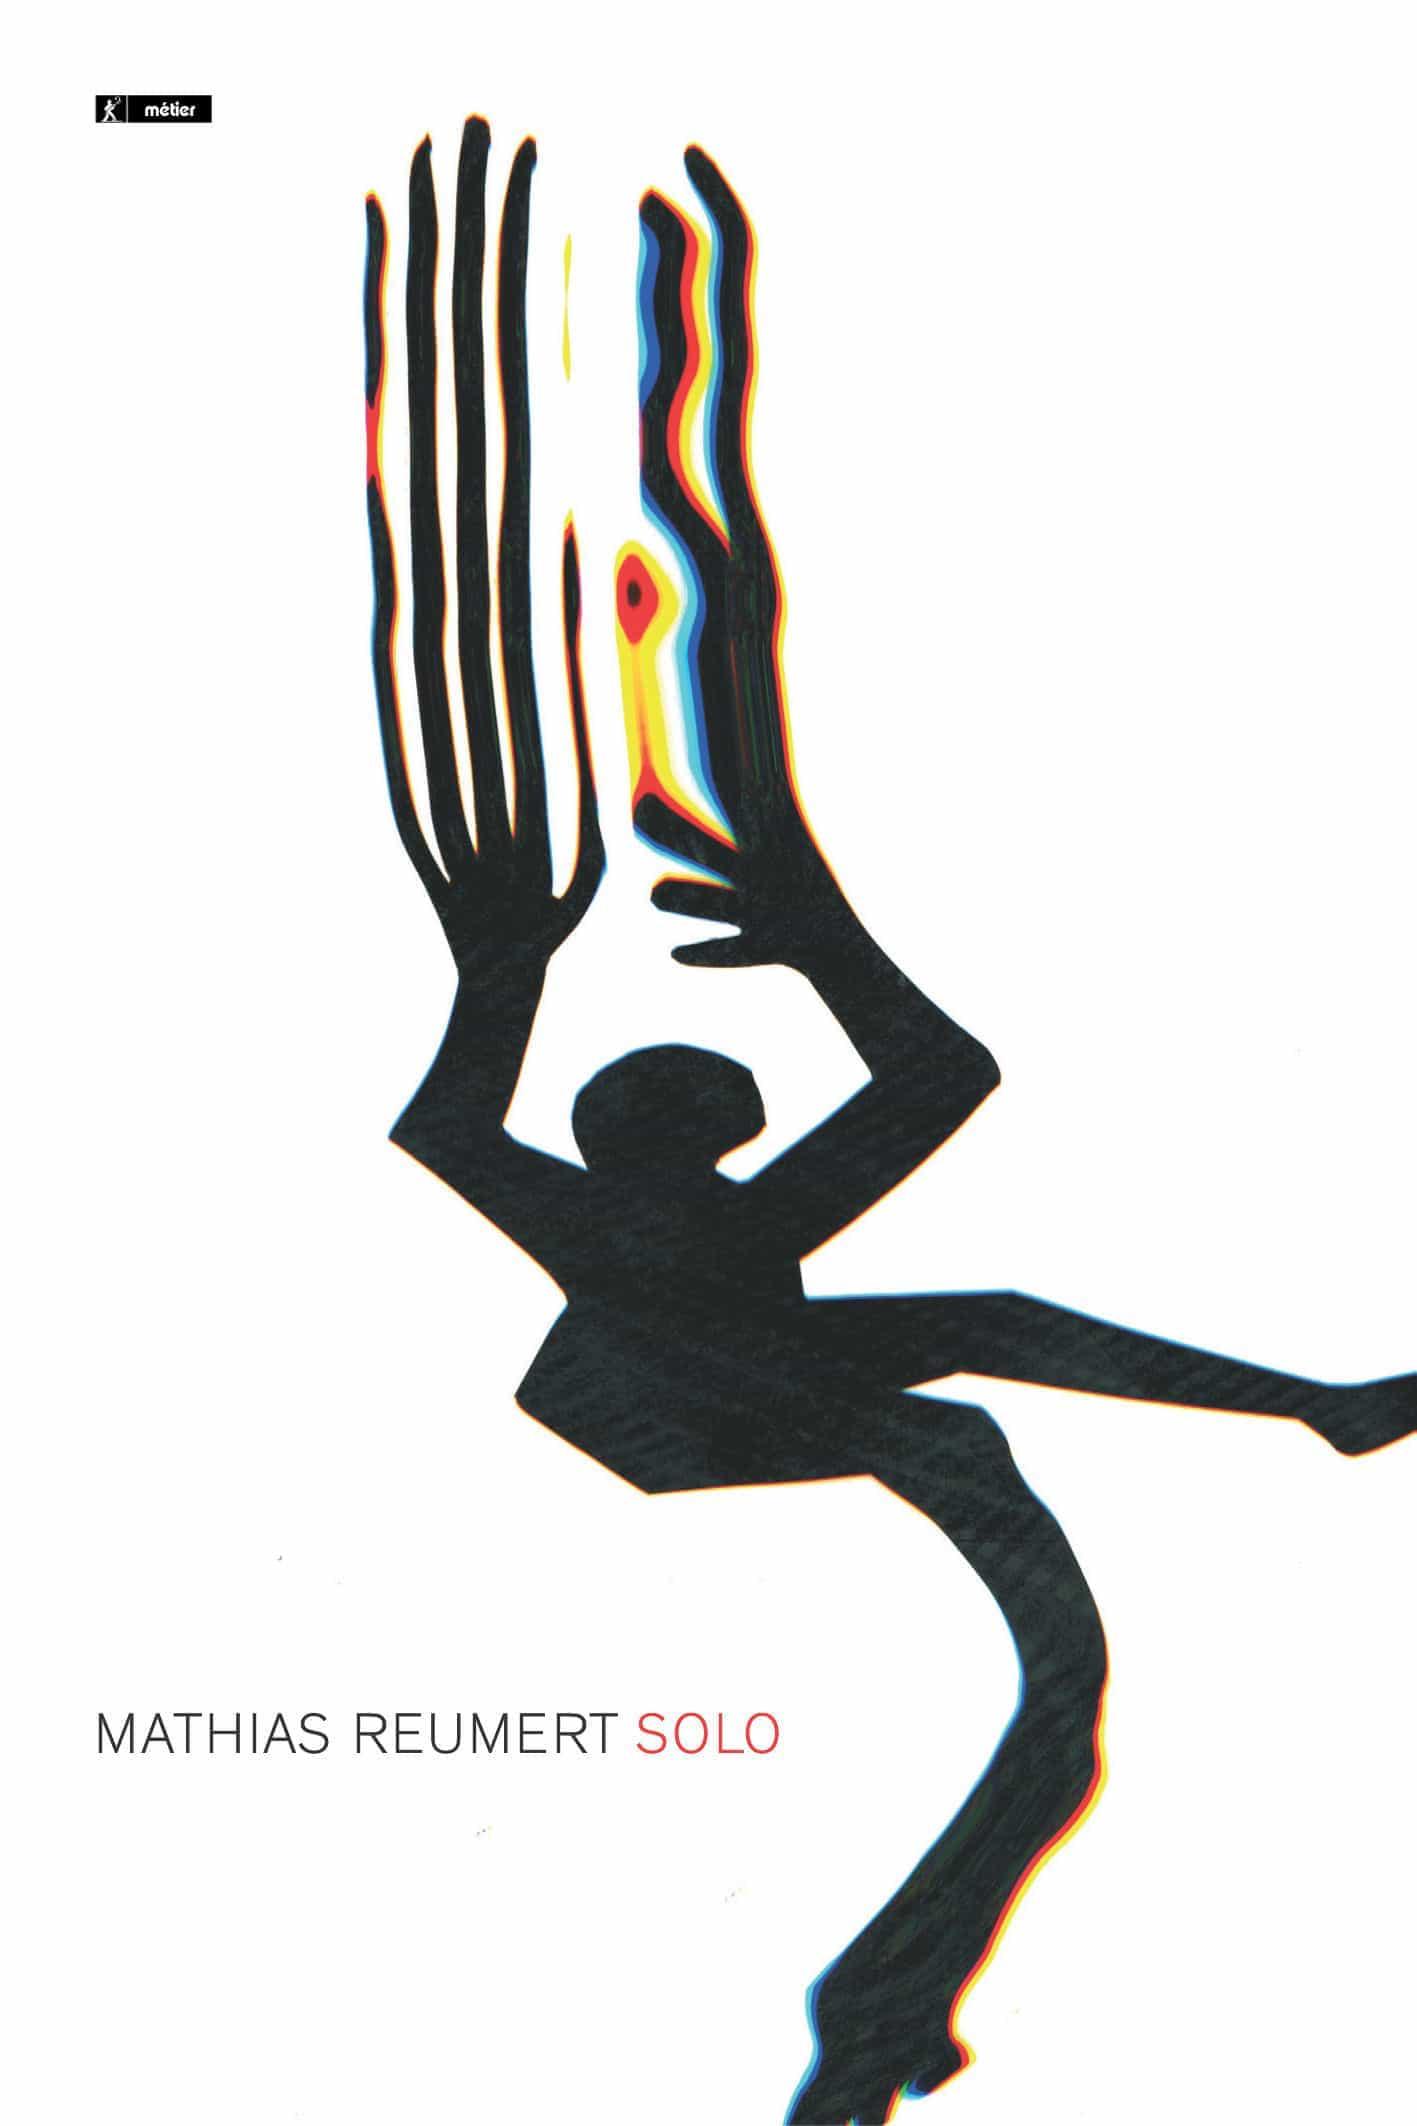 Mathias Reumert: Solo